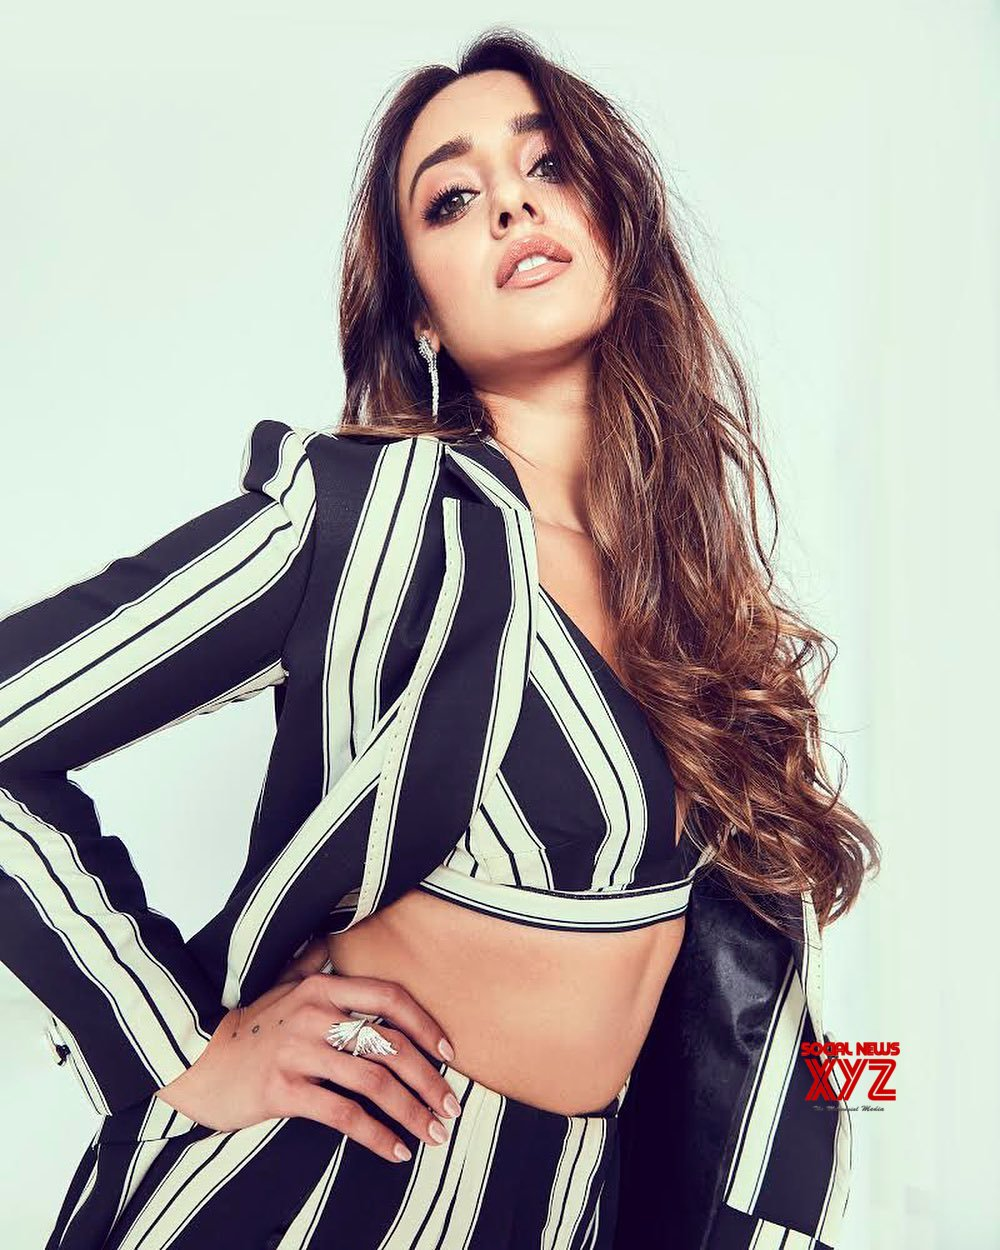 Ileana D Cruz Hot And Sexy Images actress ileana d'cruz latest hot and glam stills - social